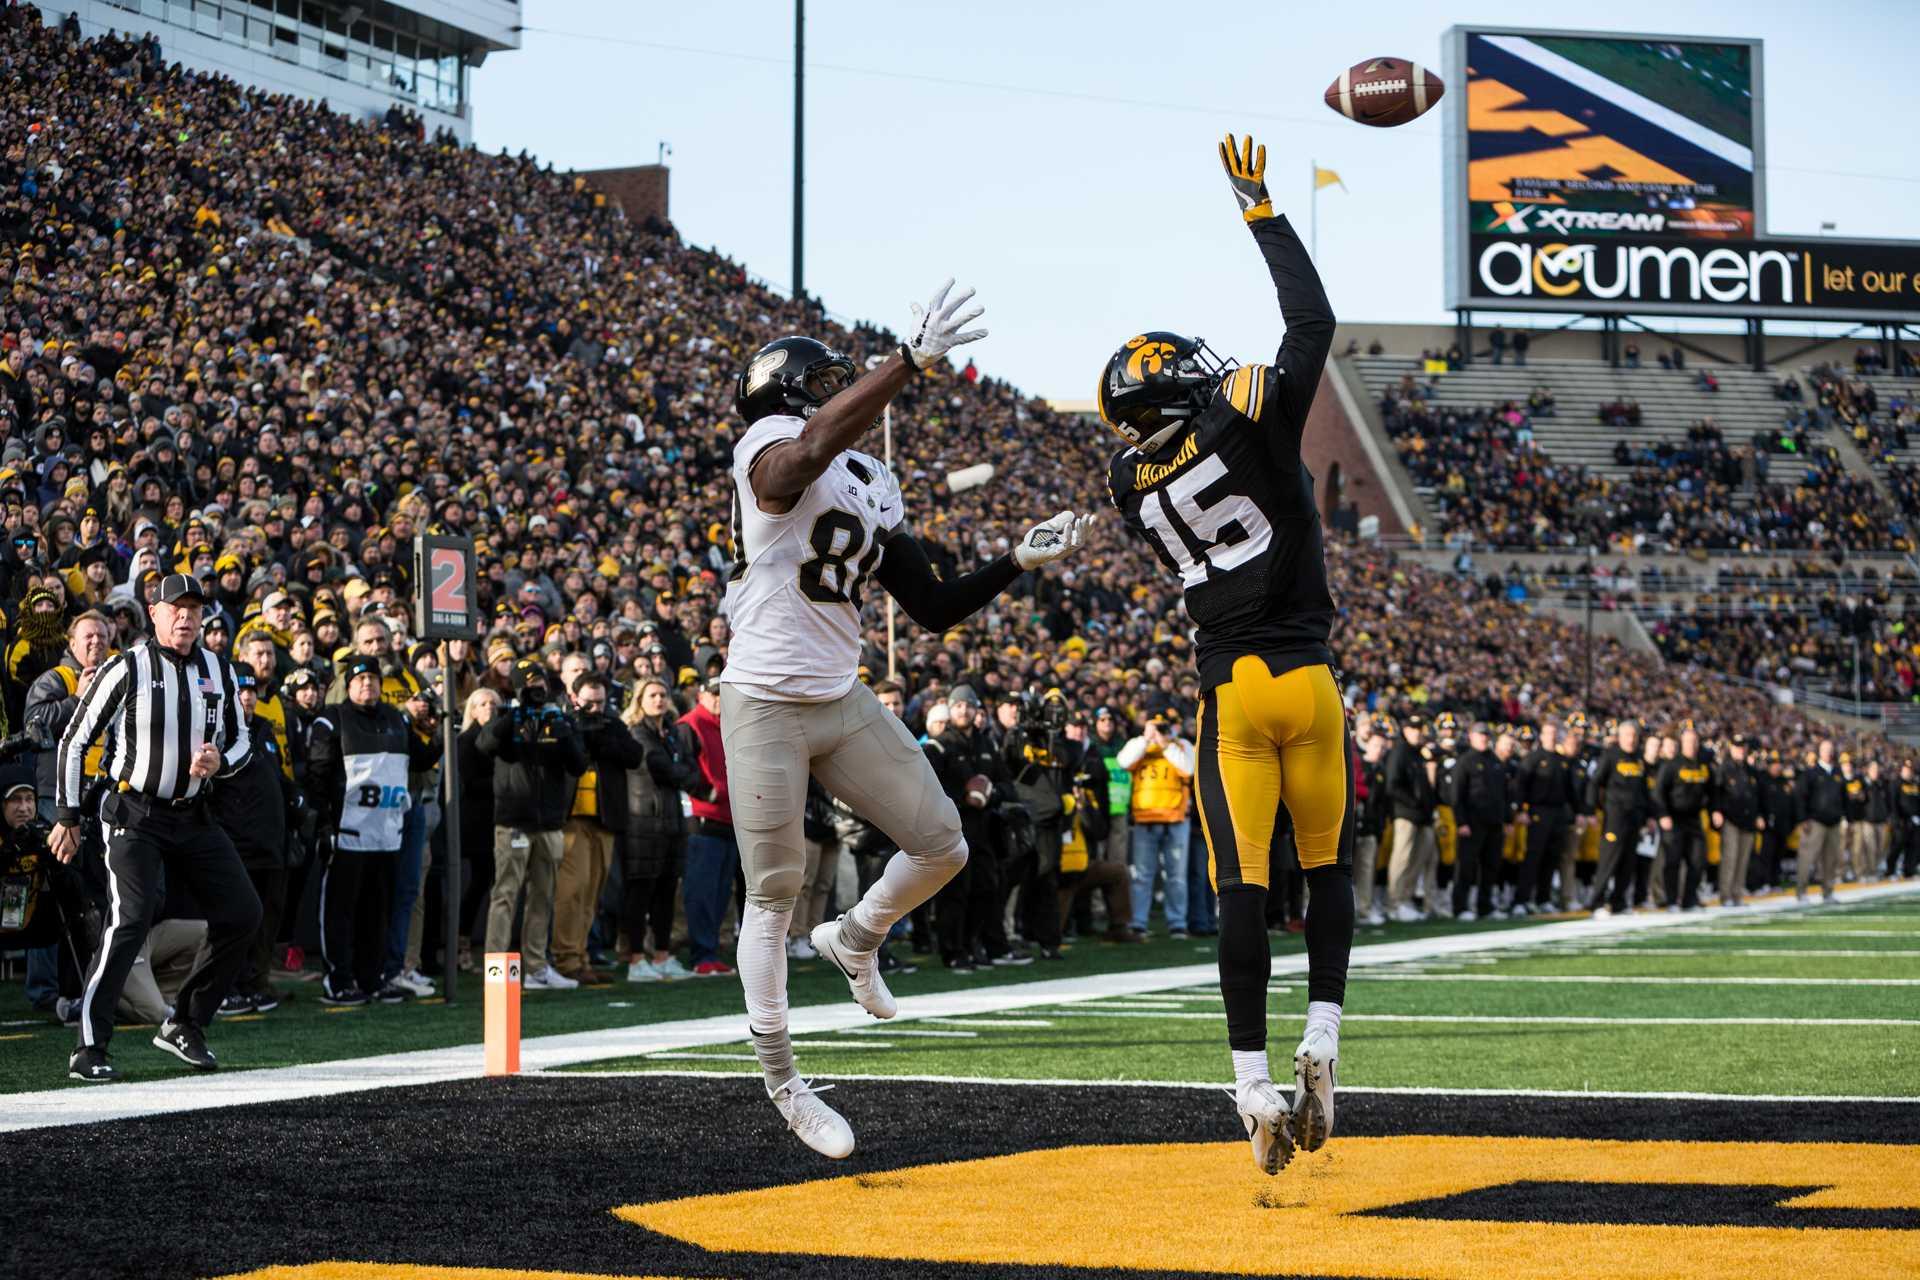 Iowa Defensive Back Josh Jackson breaks up a pass during a game against Purdue University on Saturday, Nov. 18, 2017. (David Harmantas/The Daily Iowan)